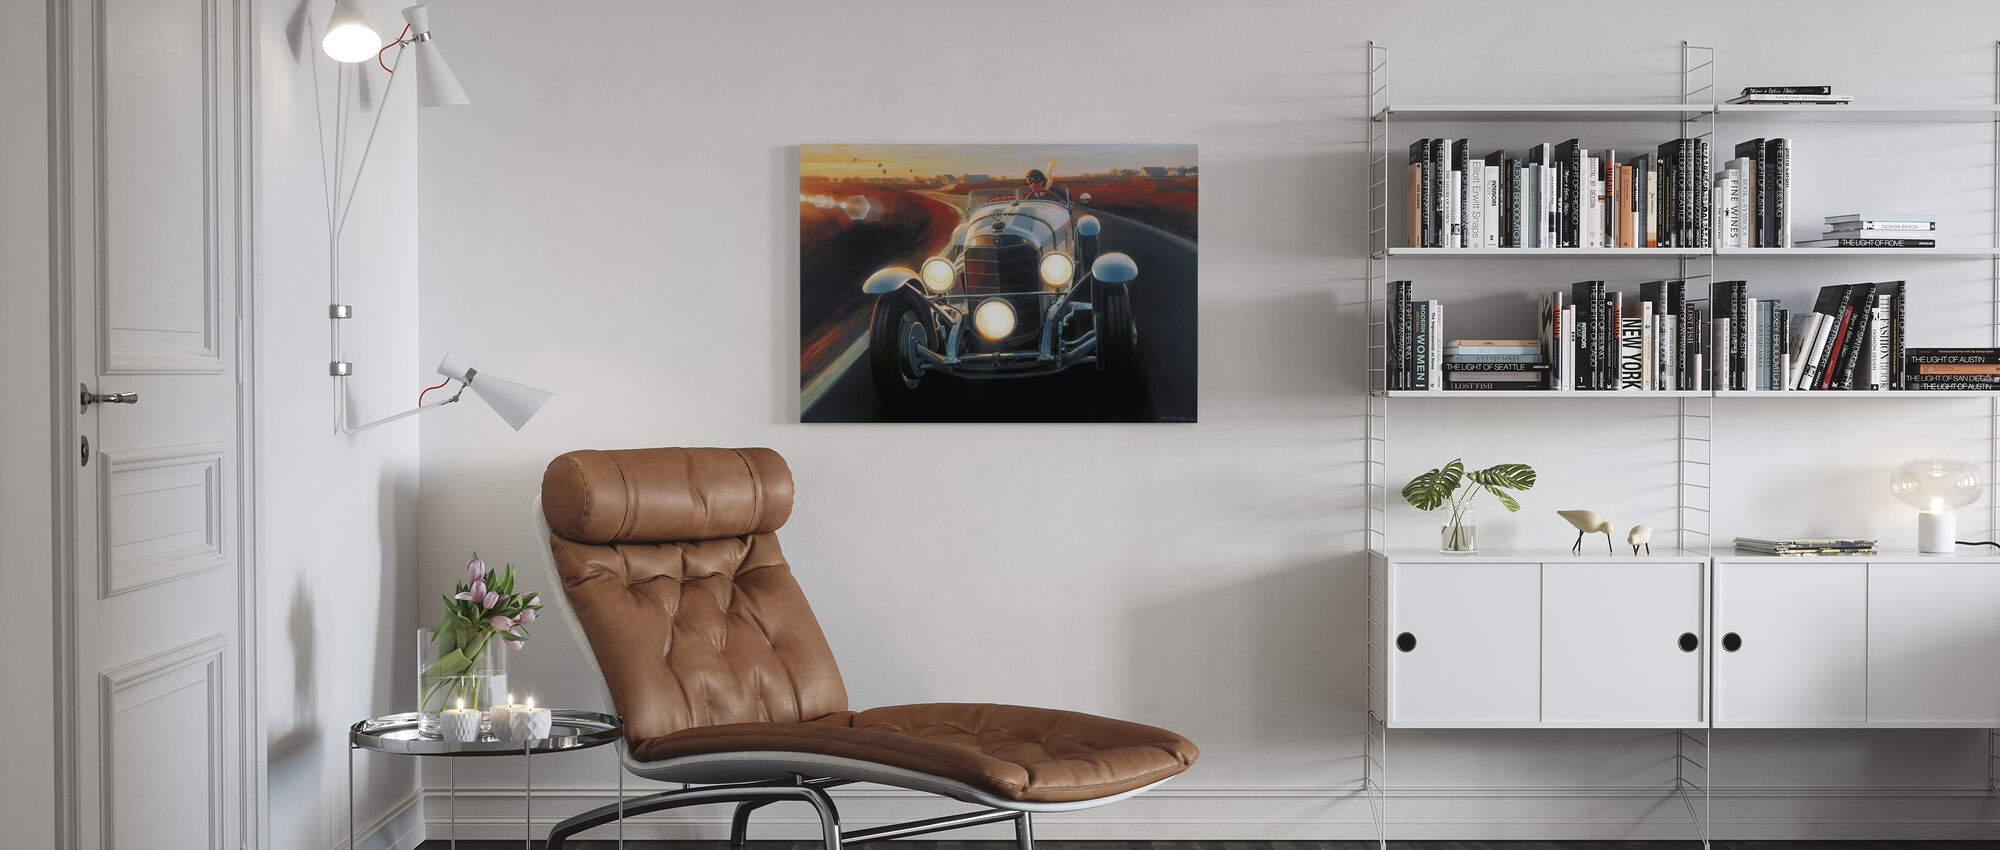 SSK - Canvas print - Woonkamer